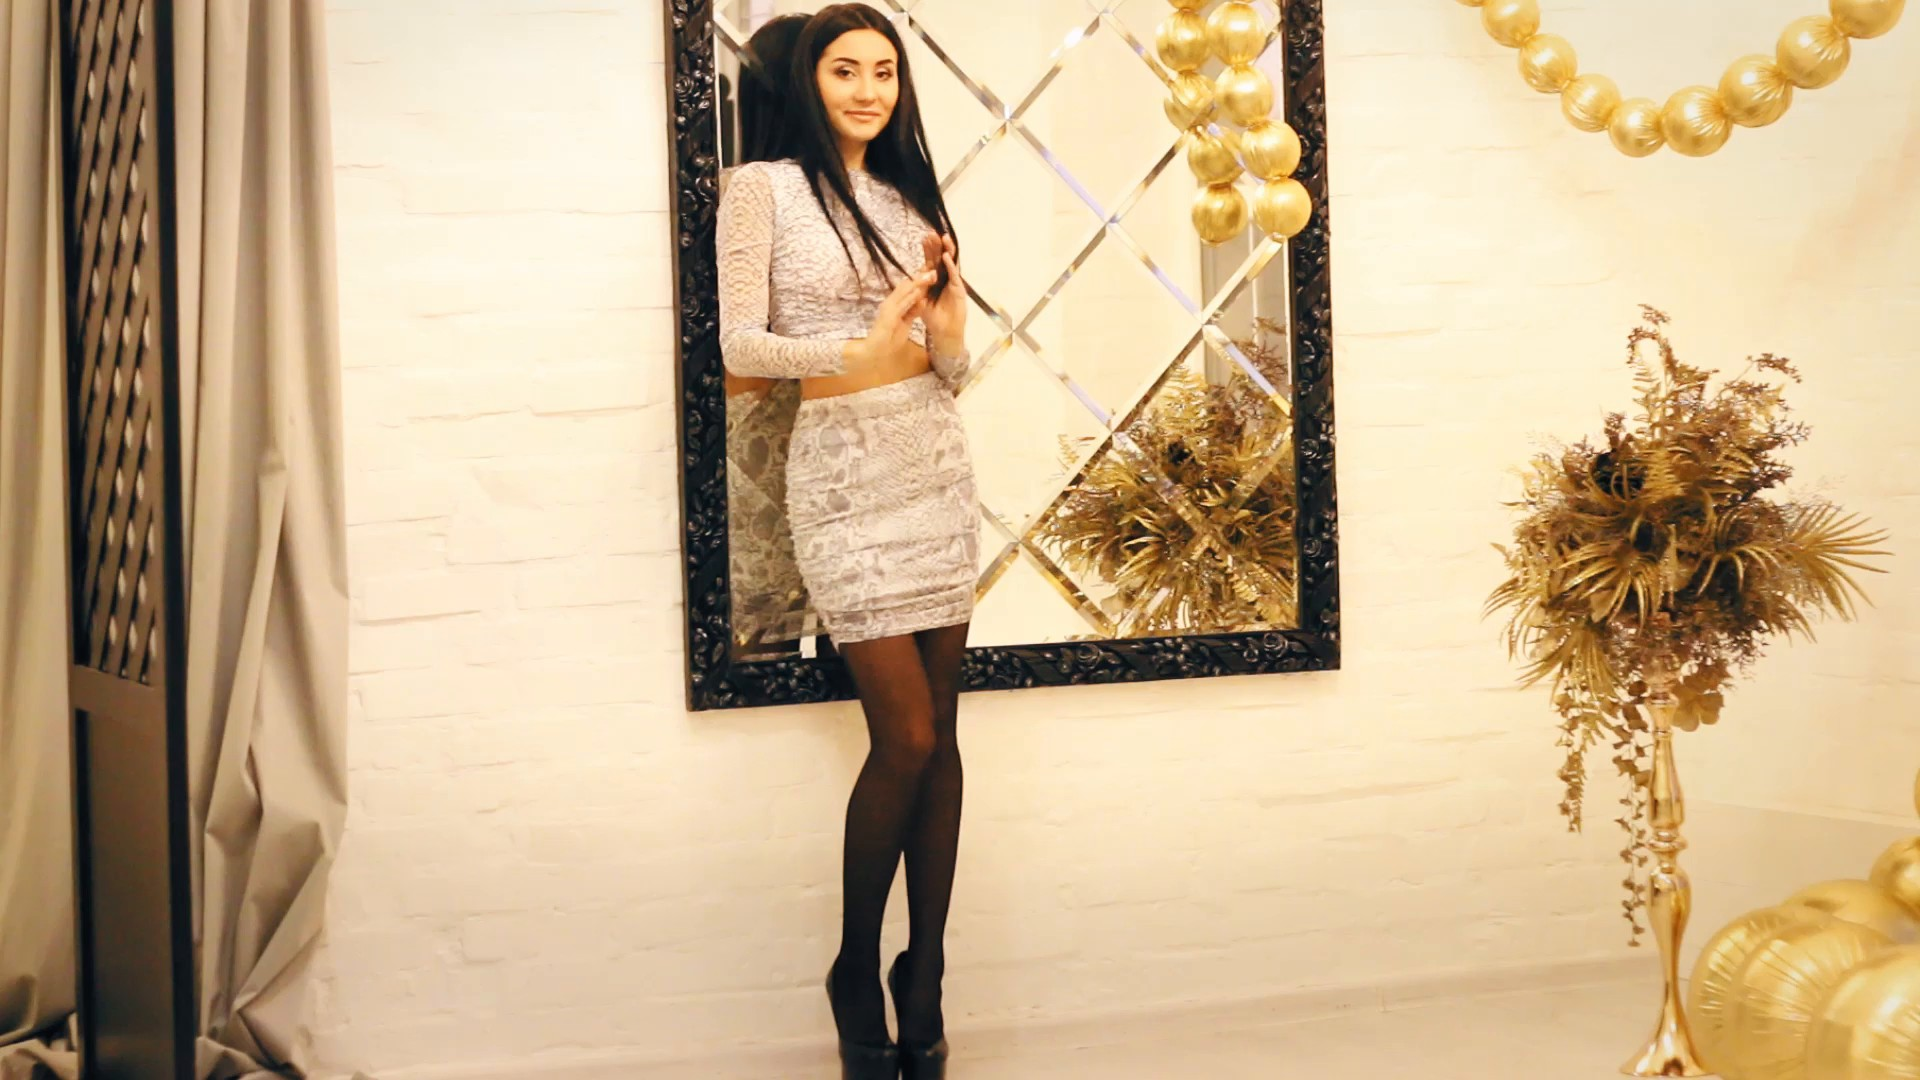 Alina Zaporozhye 24 y.o. - intelligent lady - small public photo.